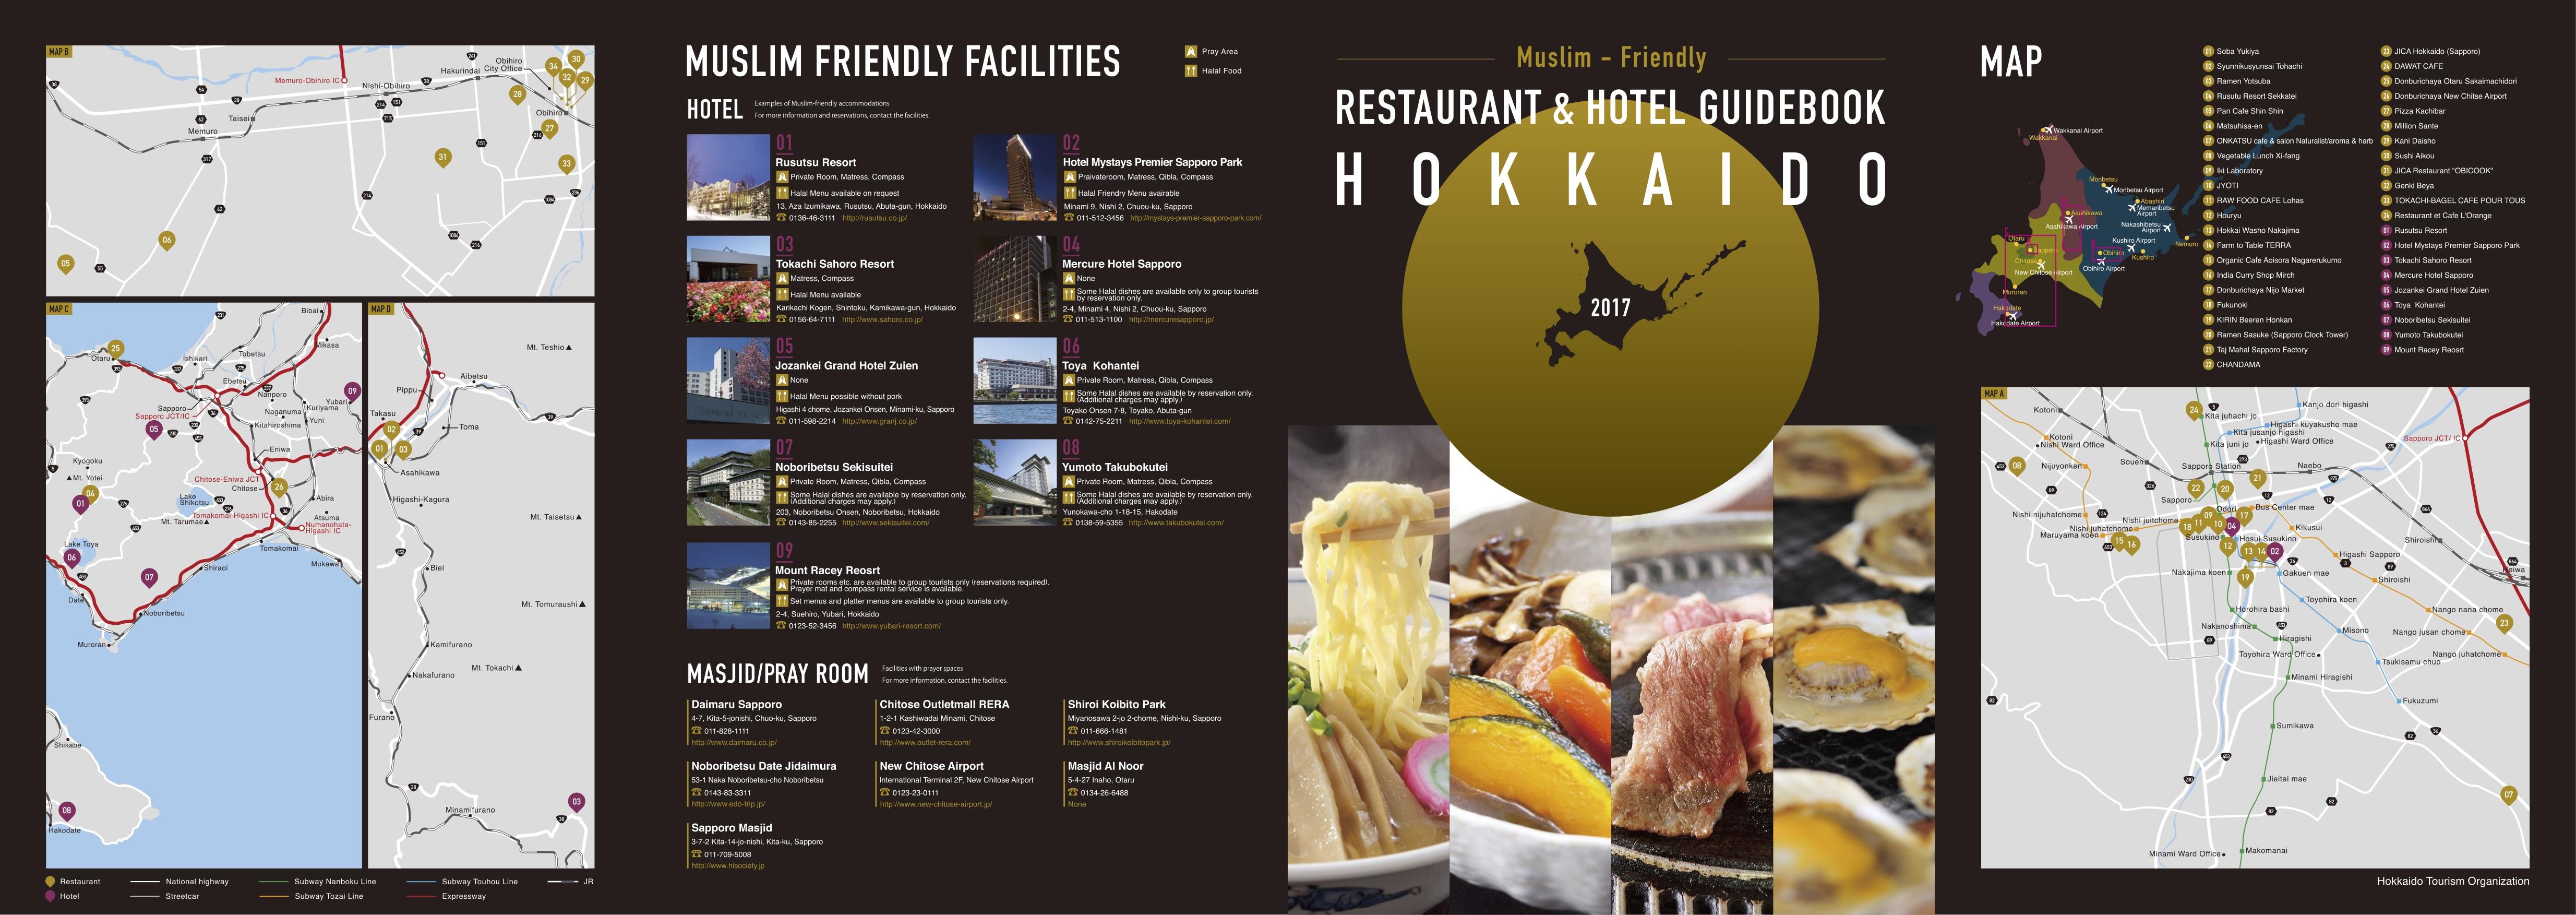 Sightseeing Guide | Halal Media Japan